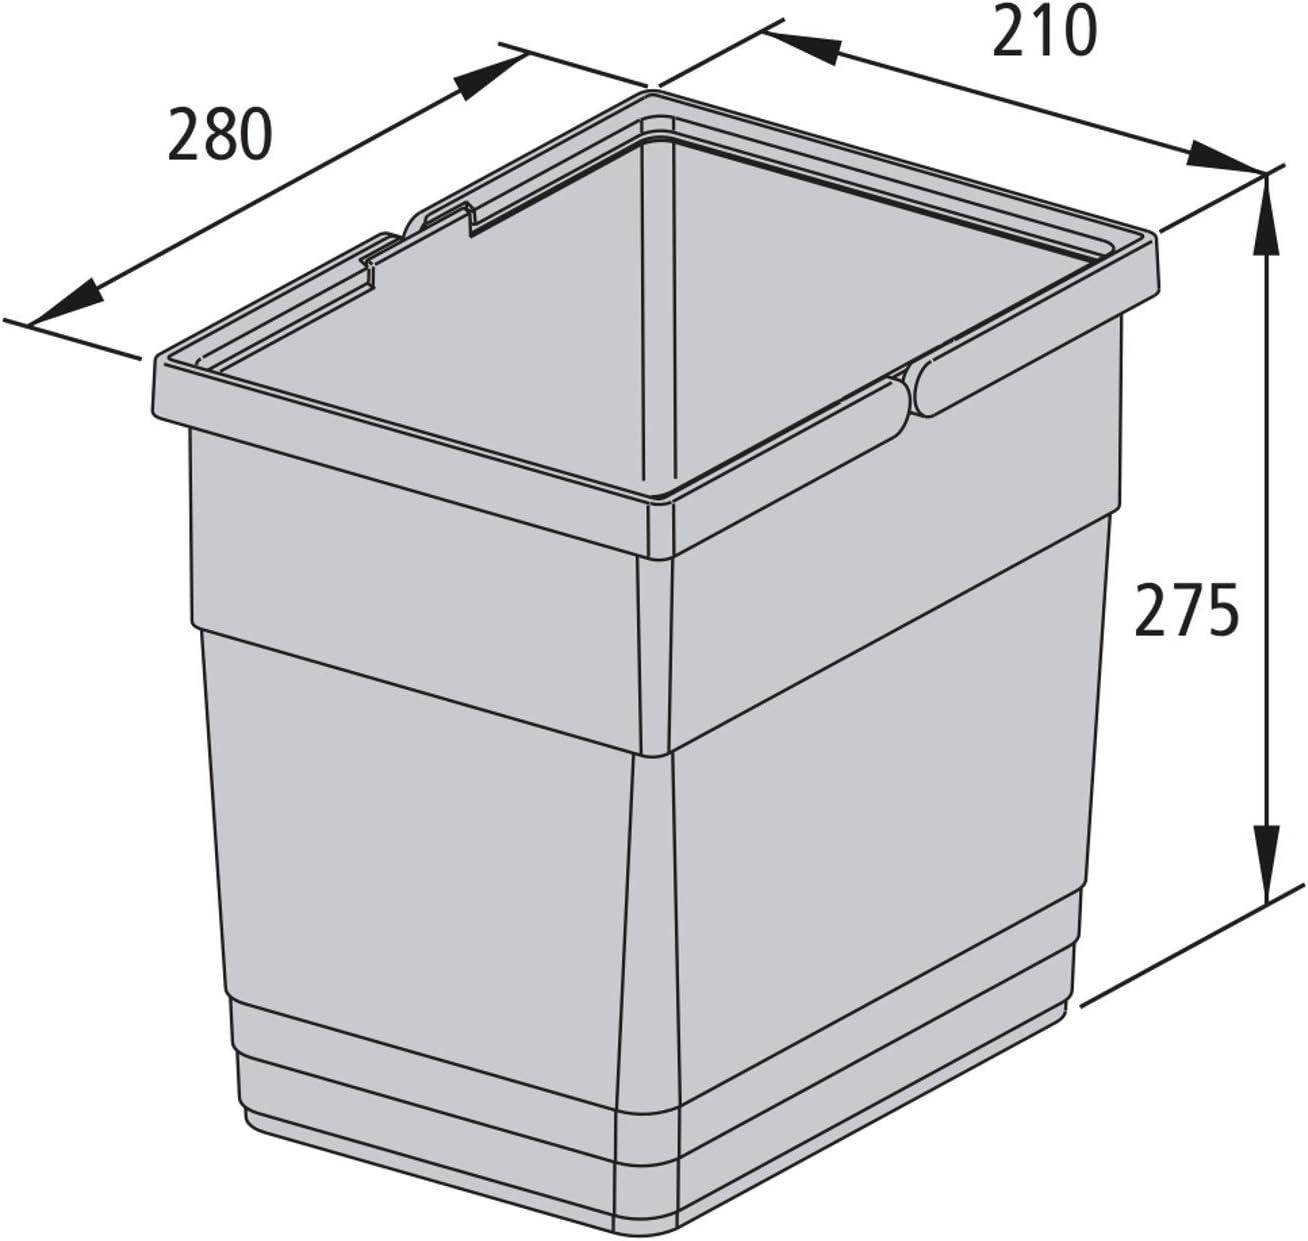 SOTECH Waste Bin Waste Collector 5136.11 for the Waste Separation System eins2vier